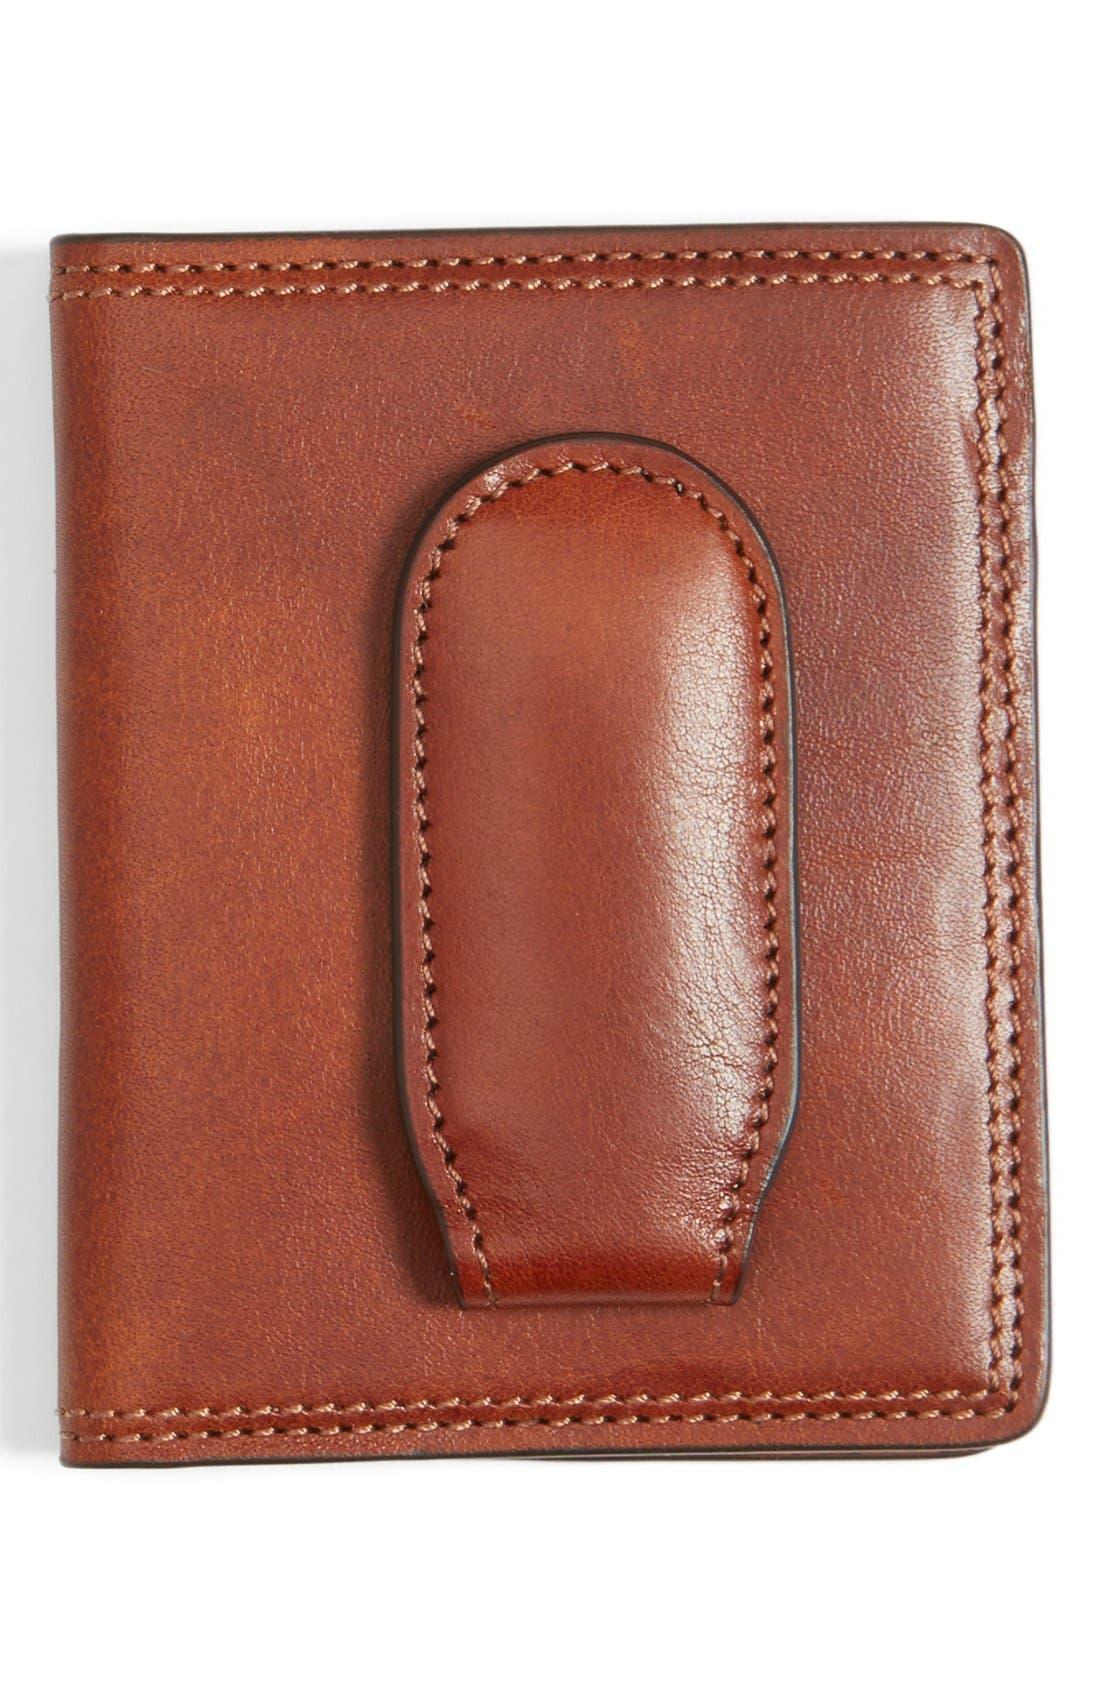 Alternate Image 1 Selected - Bosca Leather Front Pocket Money Clip Wallet